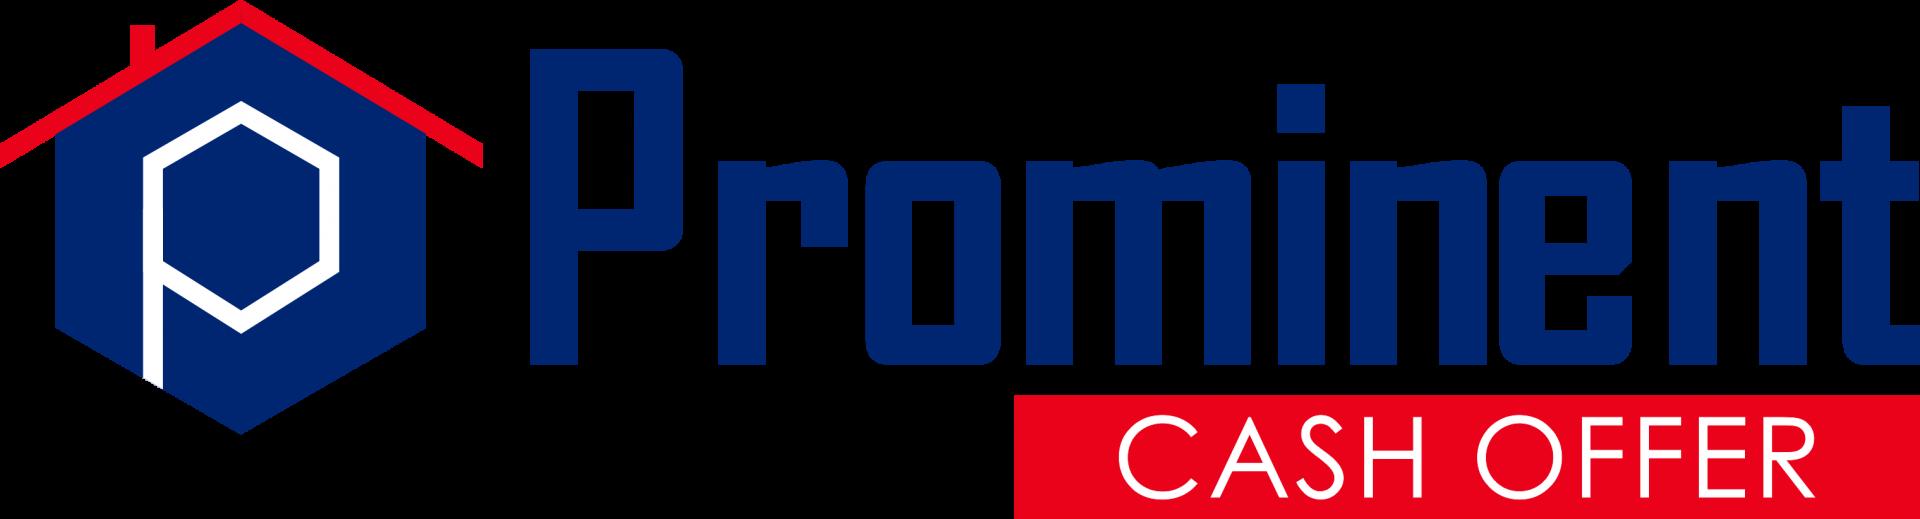 Prominent Cash Offer logo